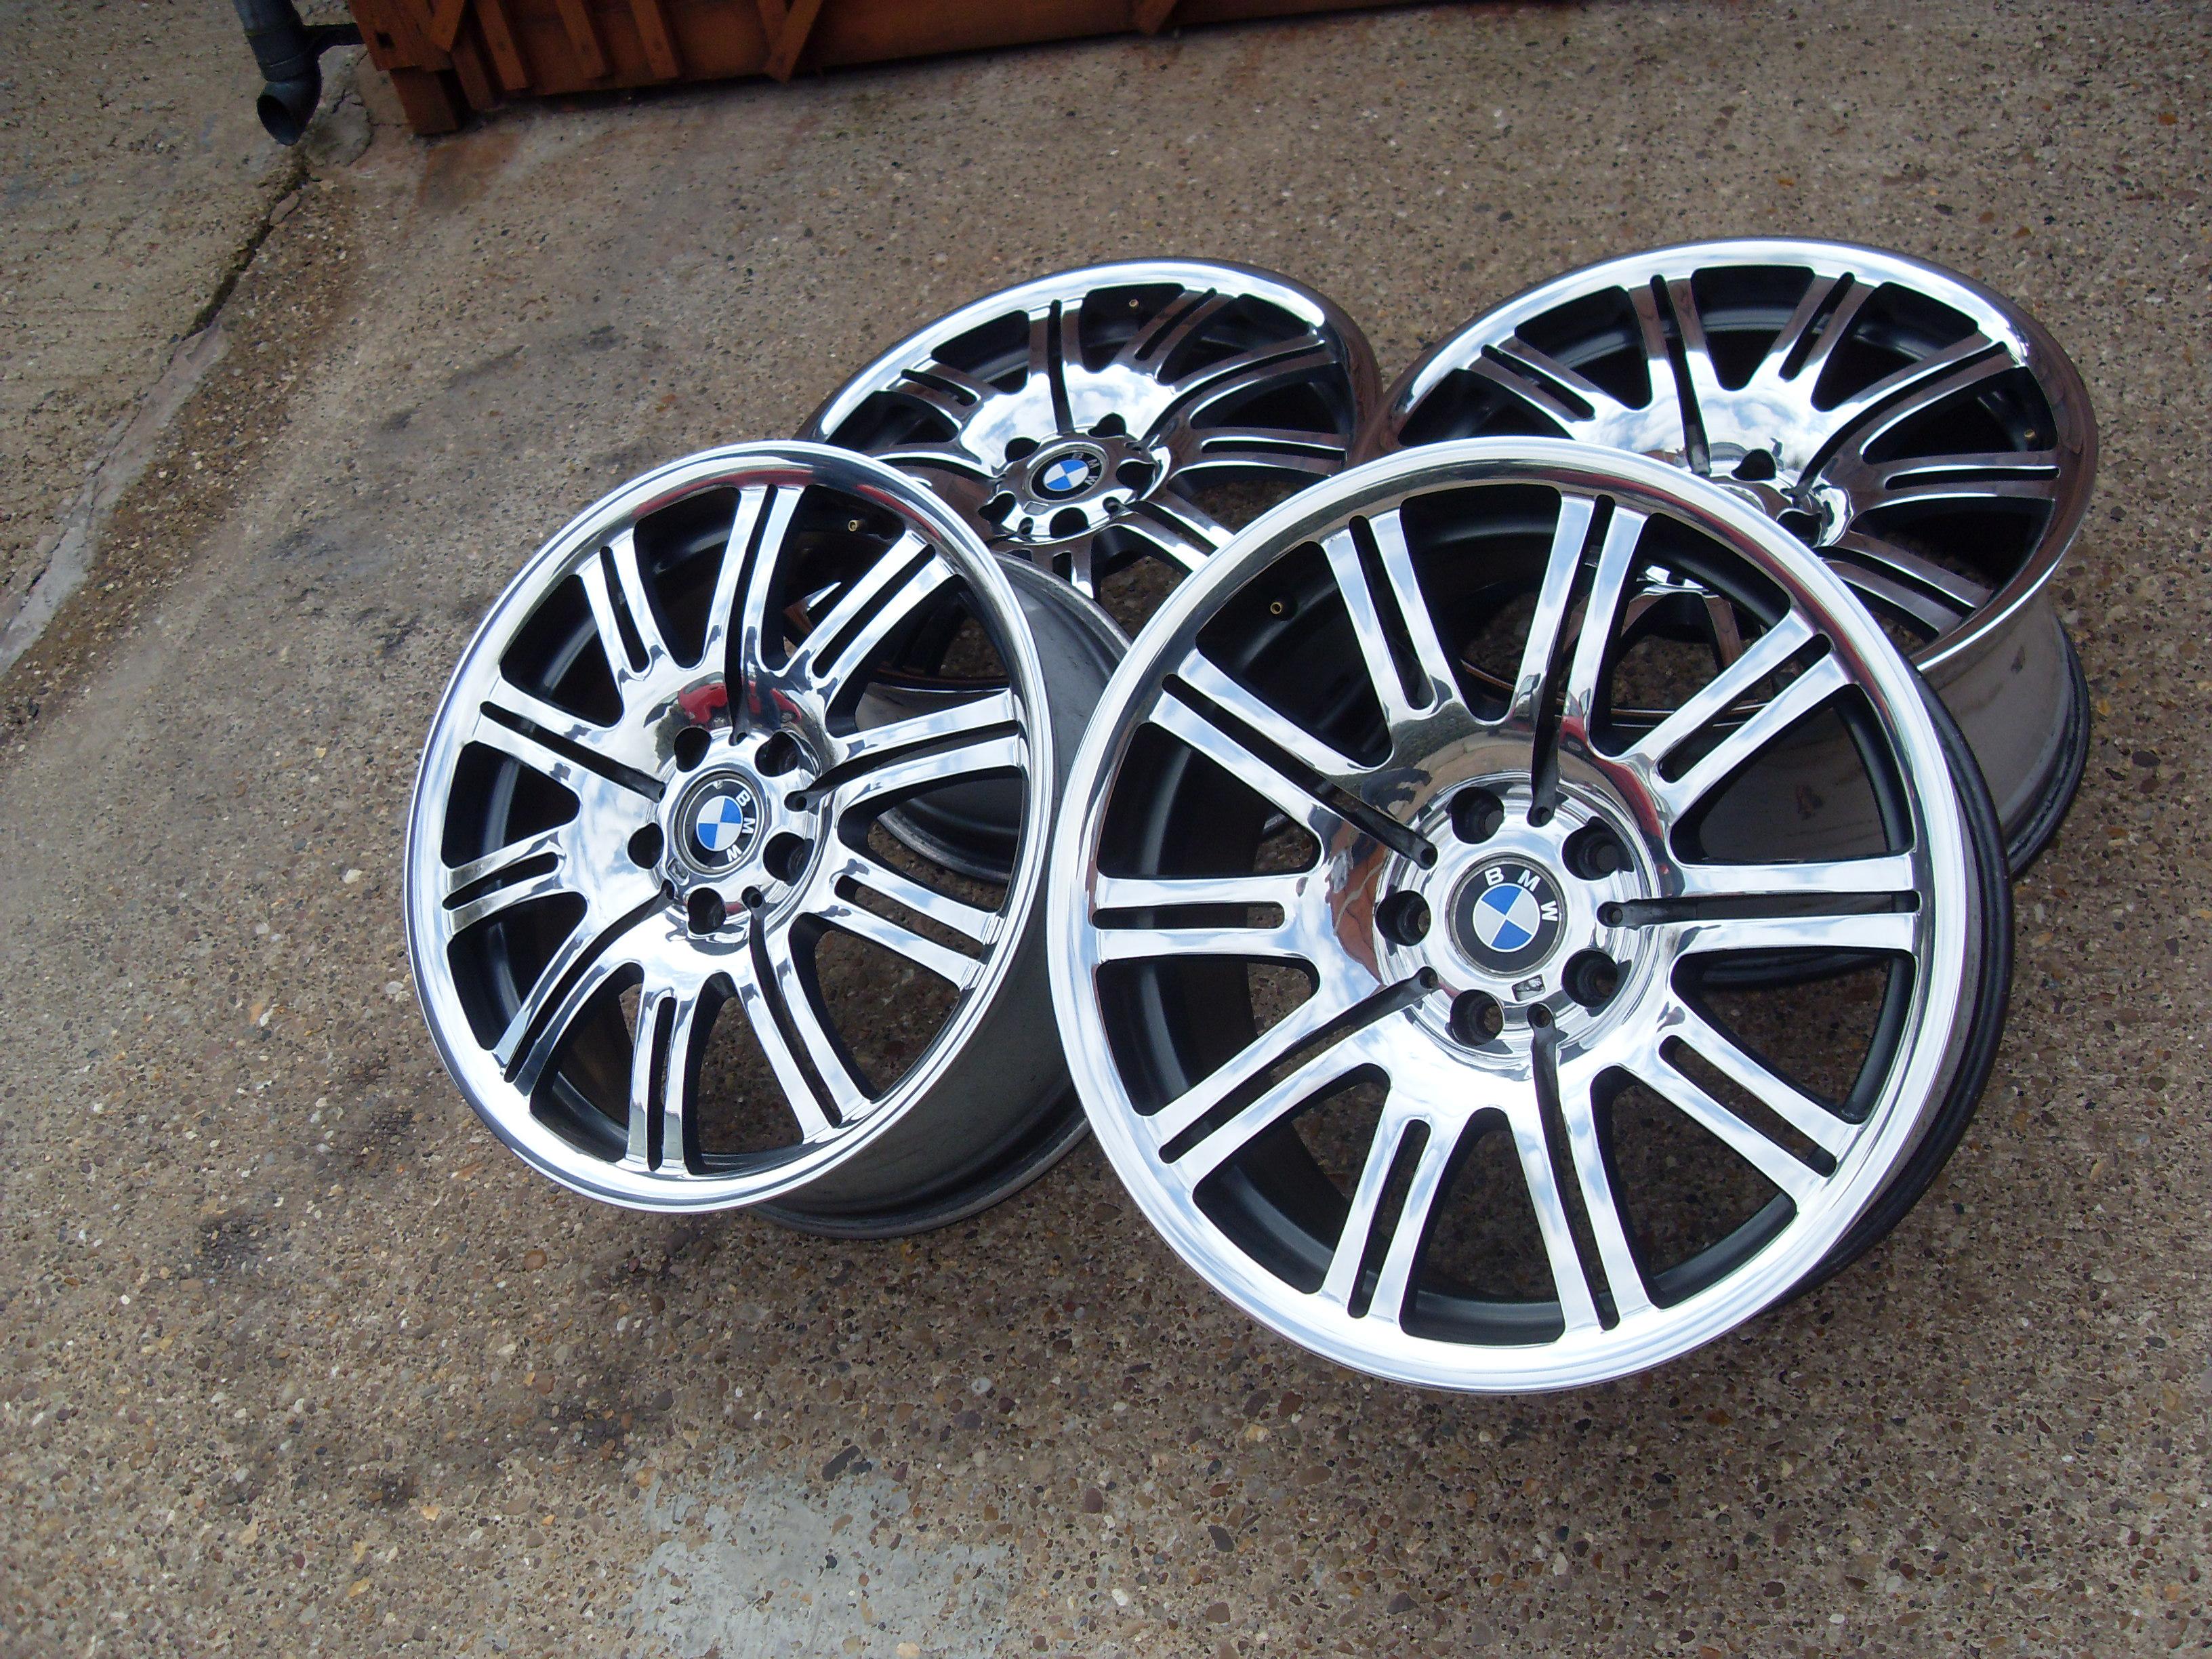 Bmw E46 M3 Wheels Refurbished And Mirror Polished Pureklas